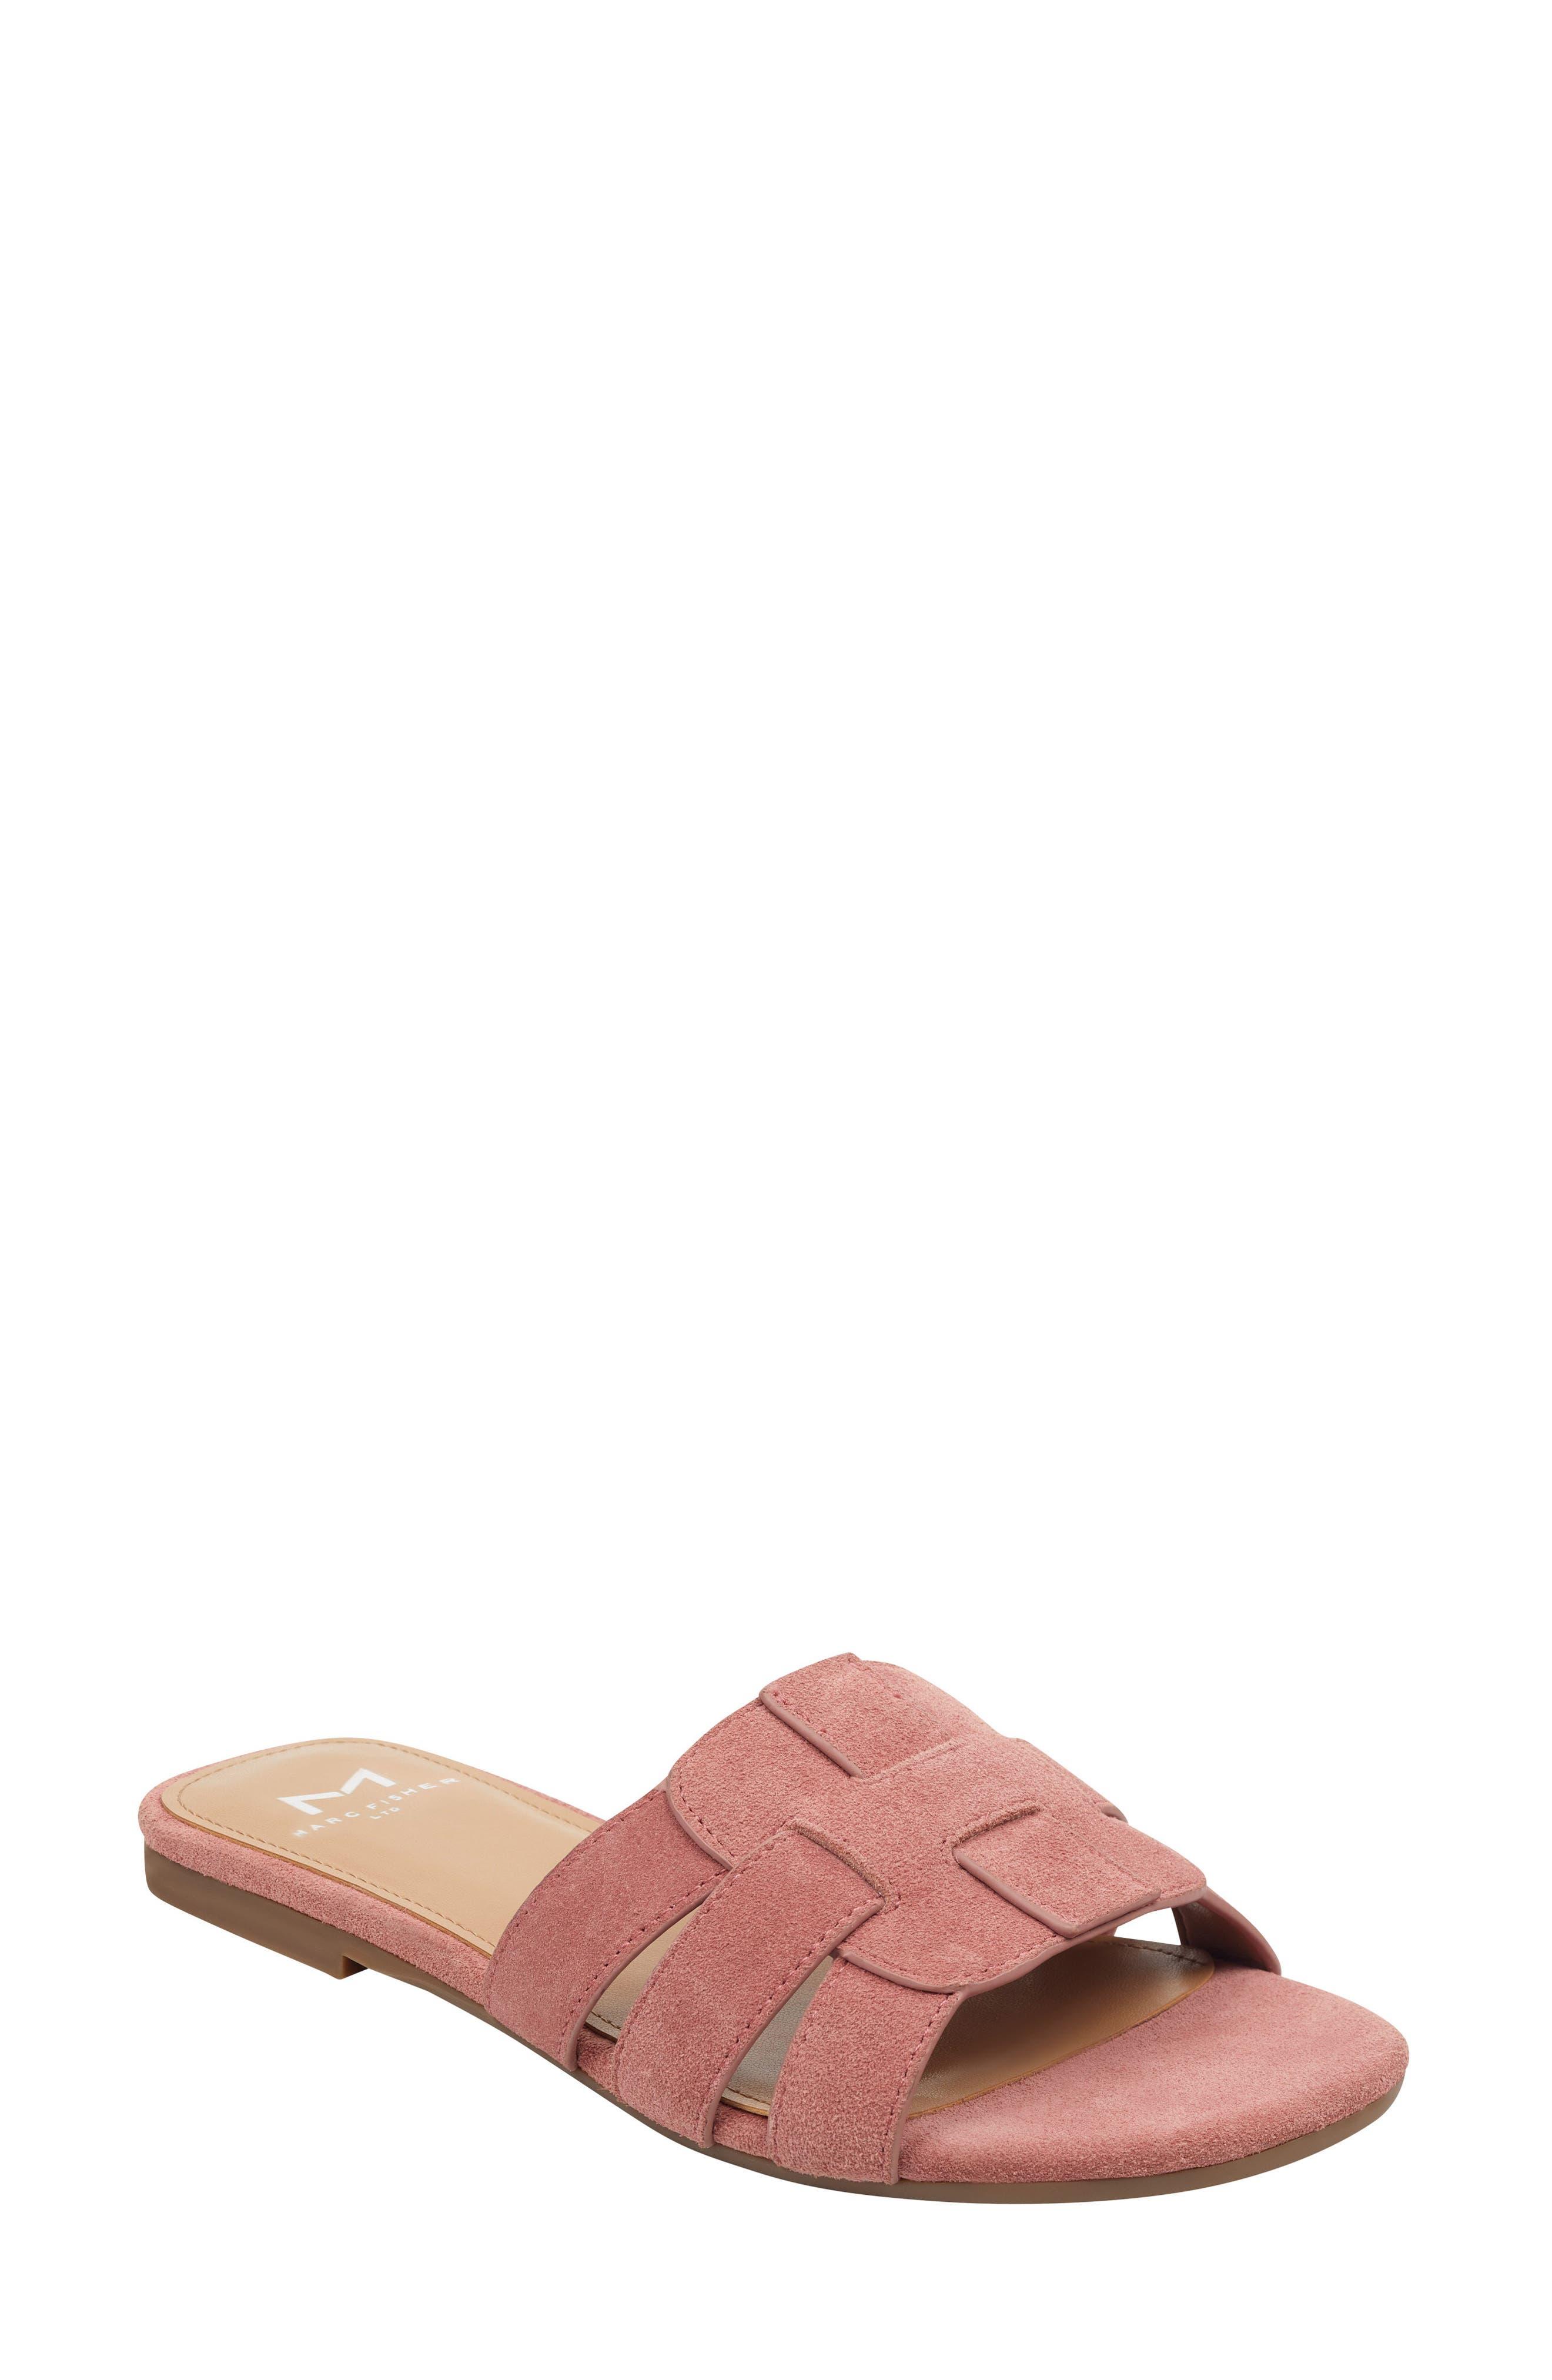 Marc Fisher Ltd Kayli Slide Sandal, Pink